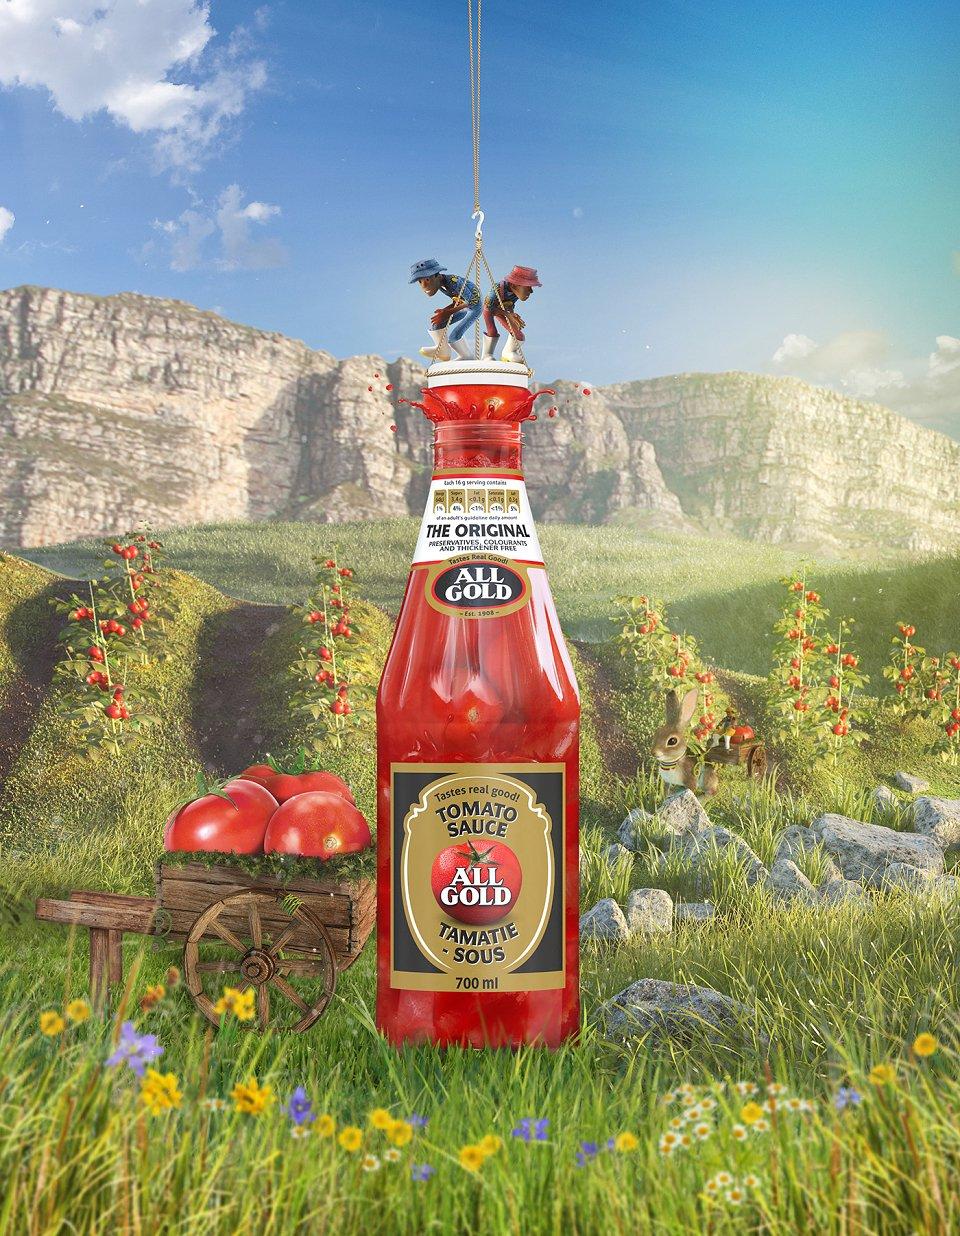 All Gold Tomato Sauce 700Ml 3